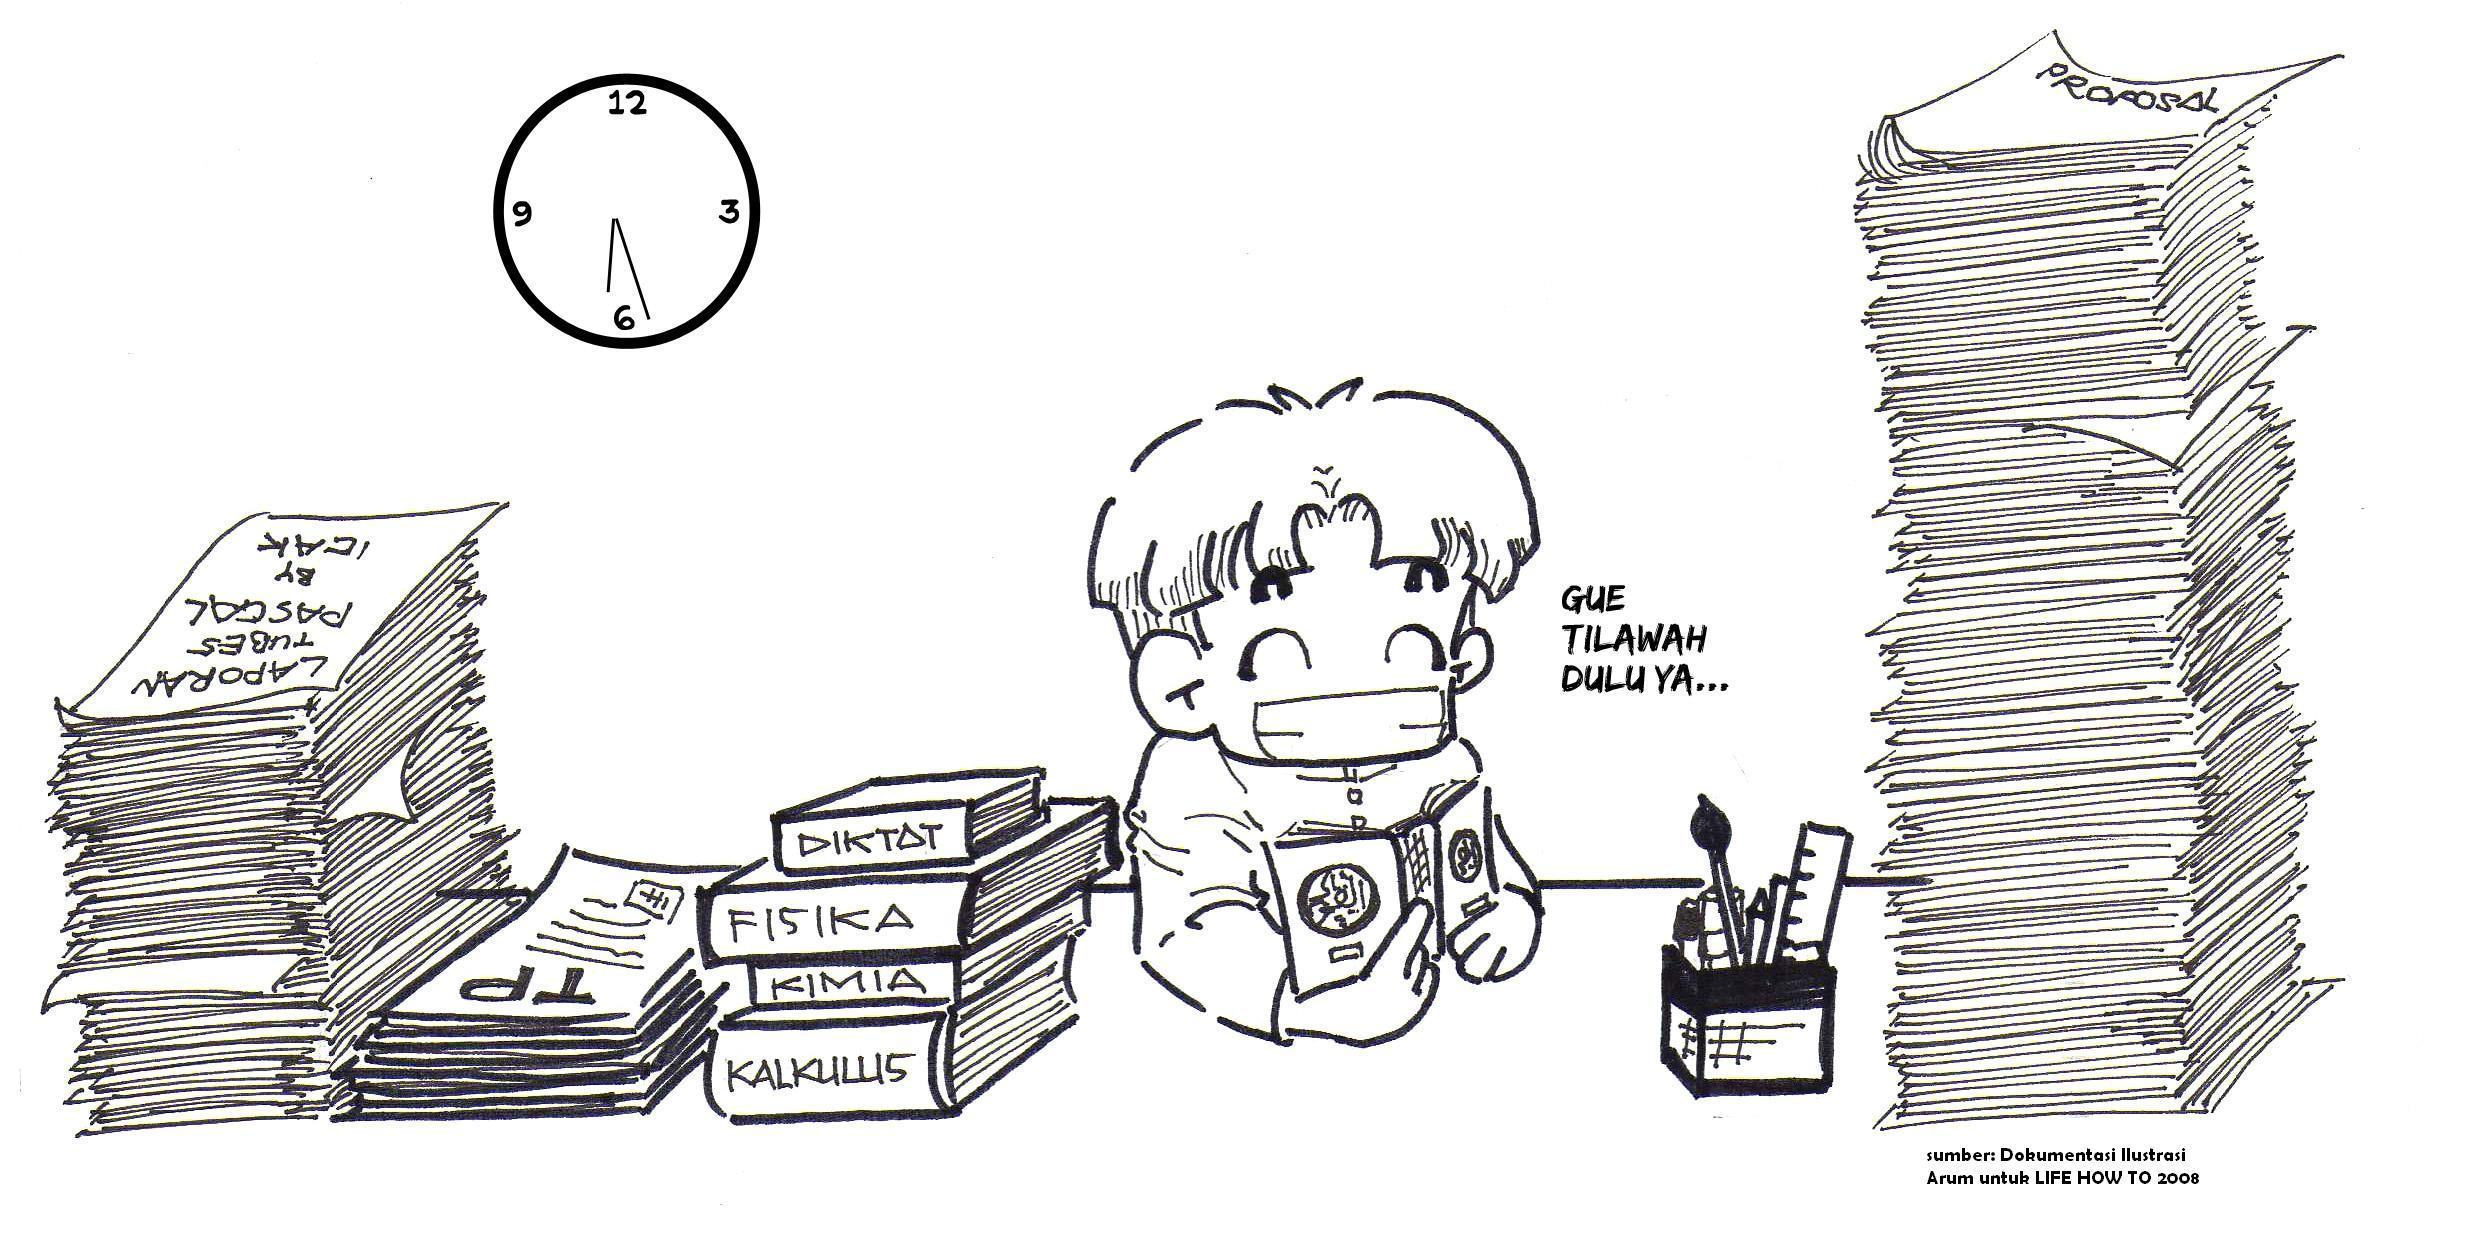 Gambar Kartun Pendidikan Rajin Gambar Unik Lucu